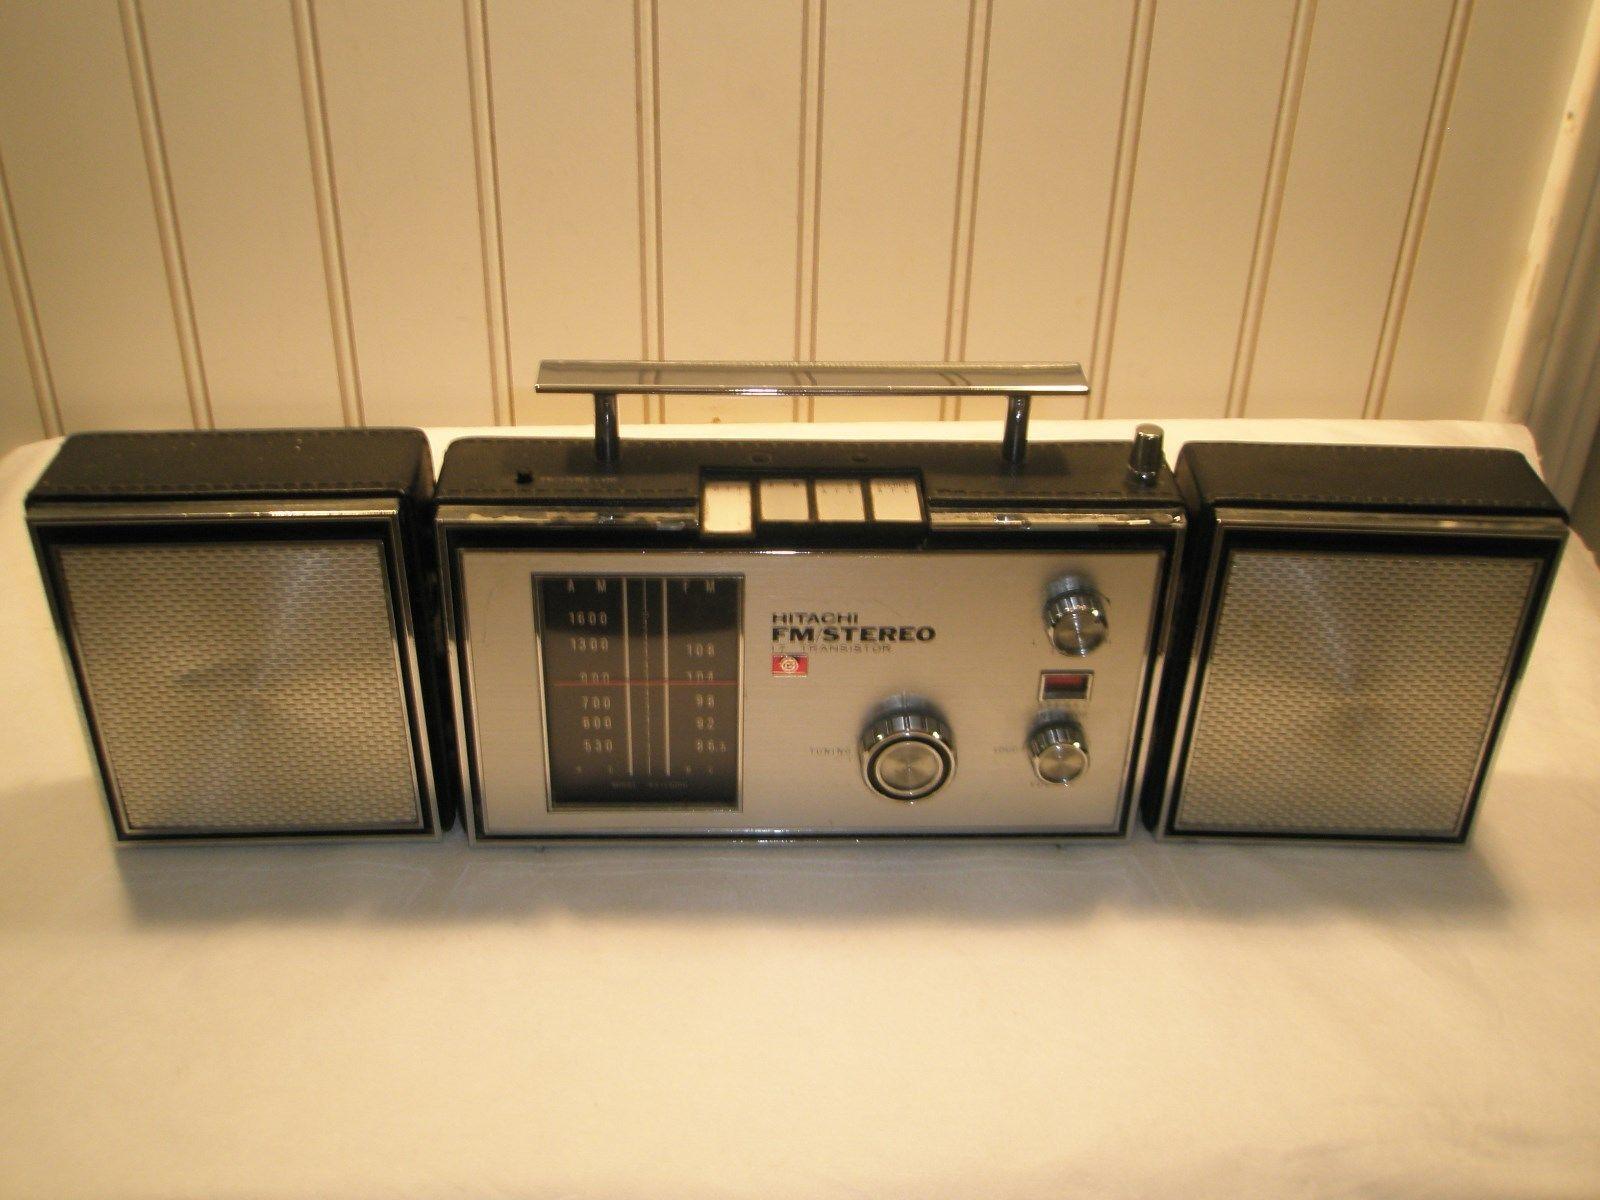 Vintage Hitachi Fm Stereo 17 Transistor Am Fm Fm Afc Radio